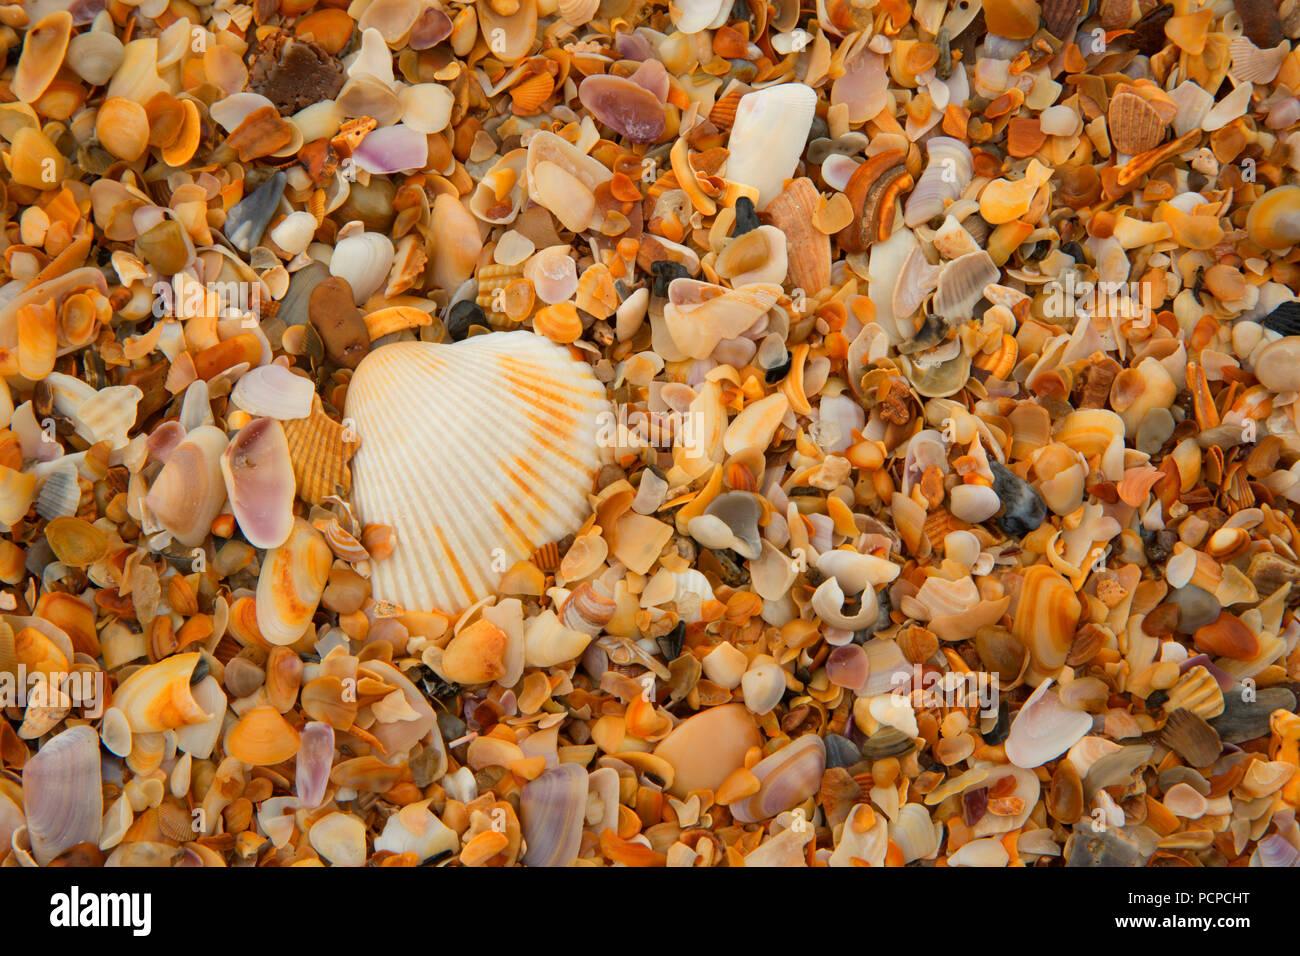 Shells on beach, Guana Tolomato Matanzas National Estuarine Research Reserve,  Florida - Stock Image